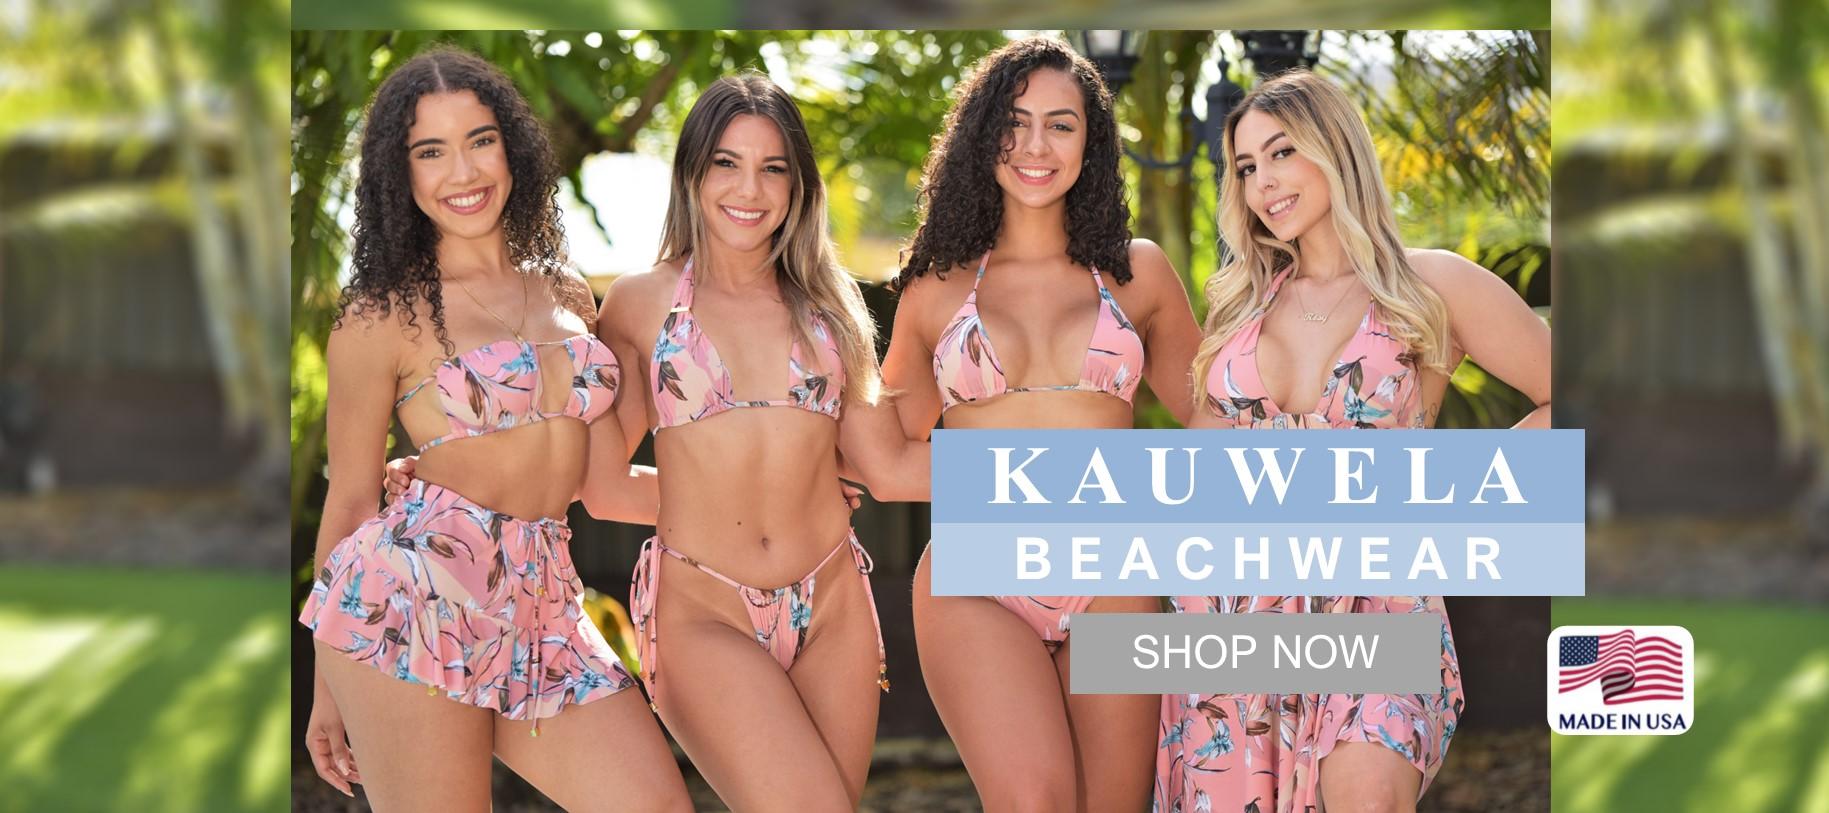 https://www.clssportswear.com/wp-content/uploads/2021/04/Announce_Slider_KAUWELA_Beachwear1.jpg